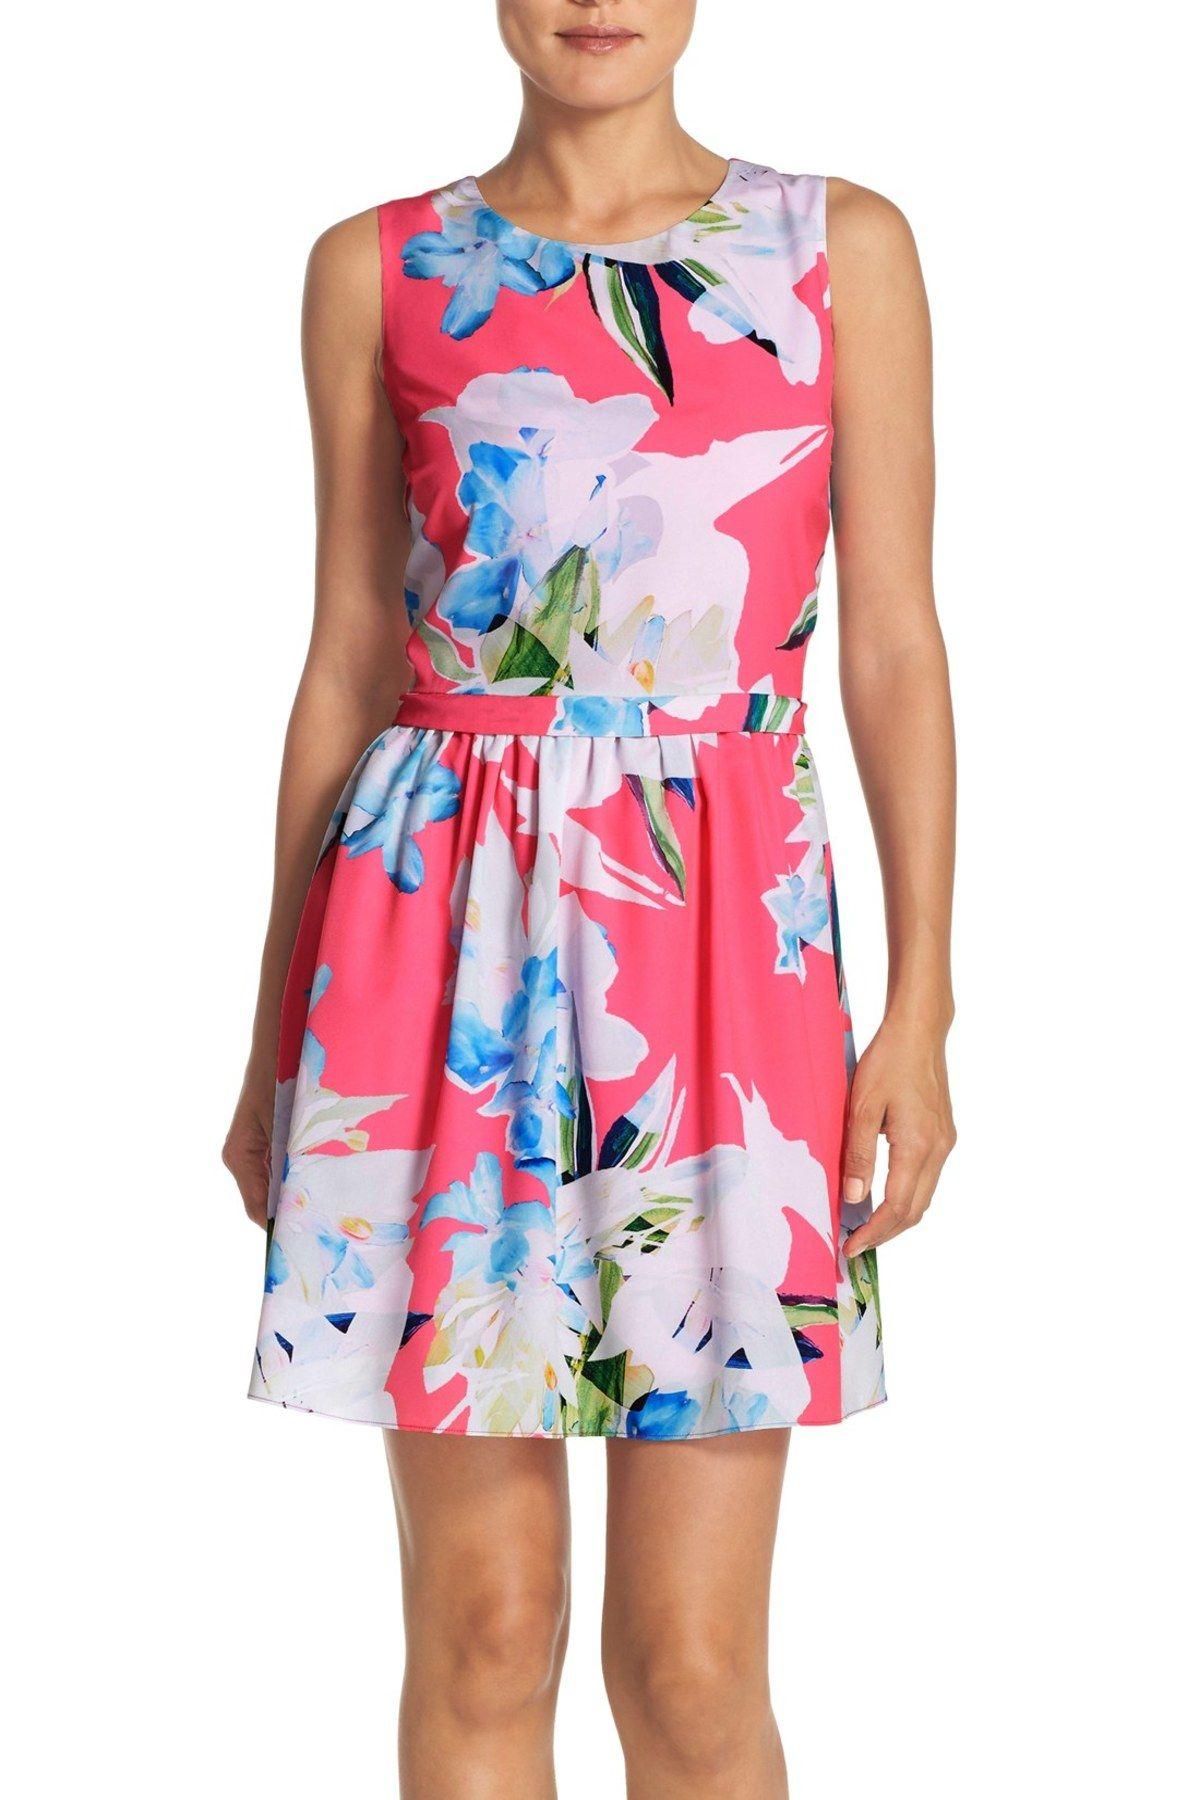 Jordyn Floral Print Fit & Flare Dress